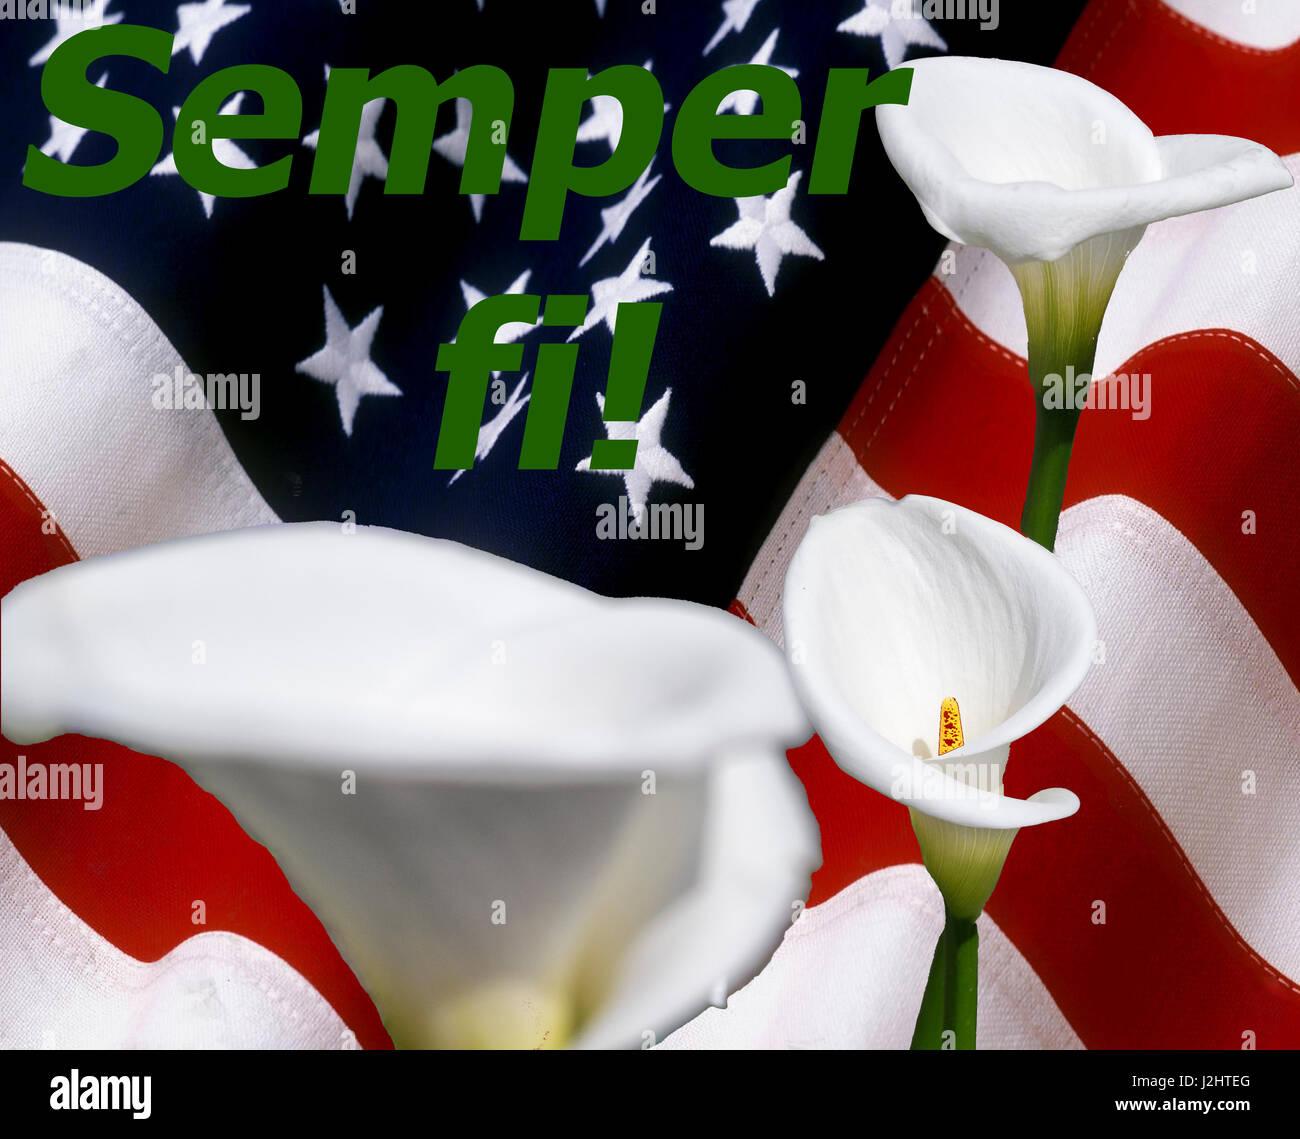 Semper Fi! Con callalily flores Foto de stock